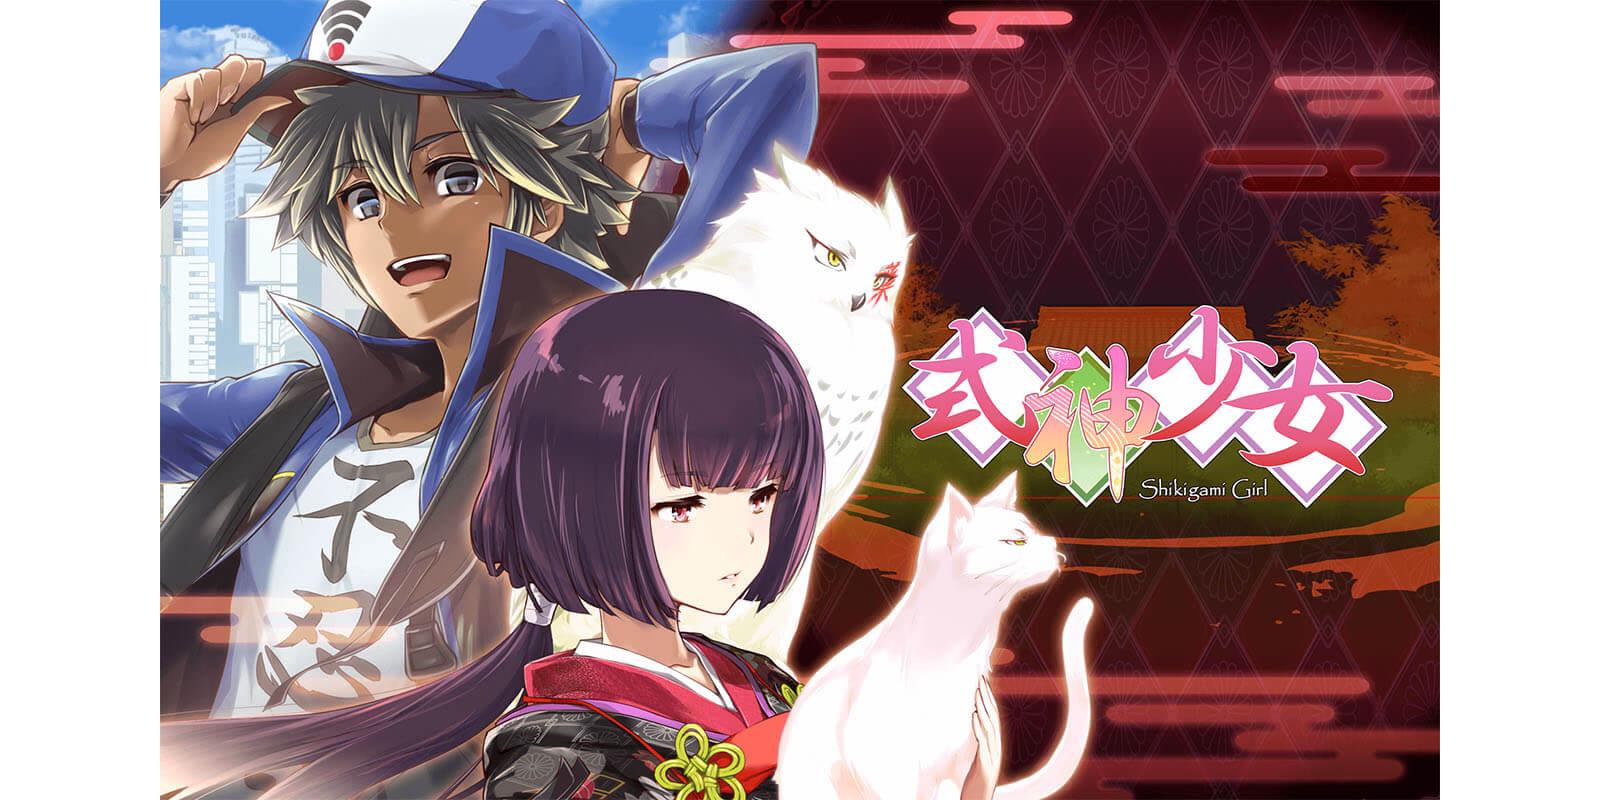 Shikigami Girl Light Novel Key Visual